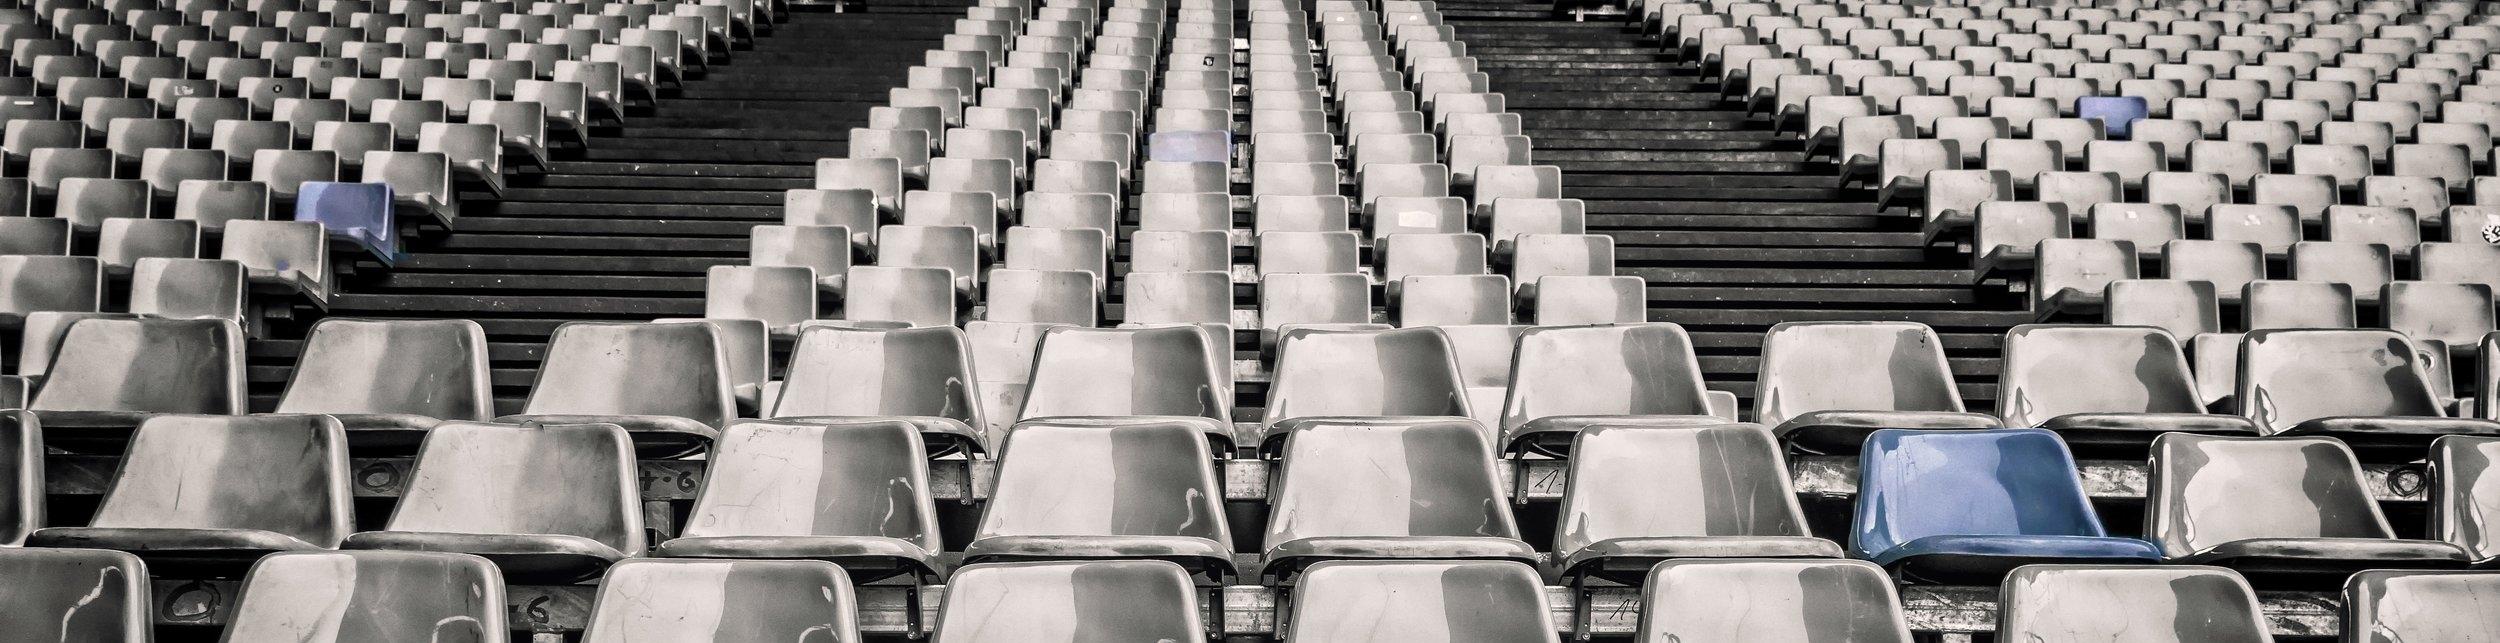 stadium-2921657.jpg